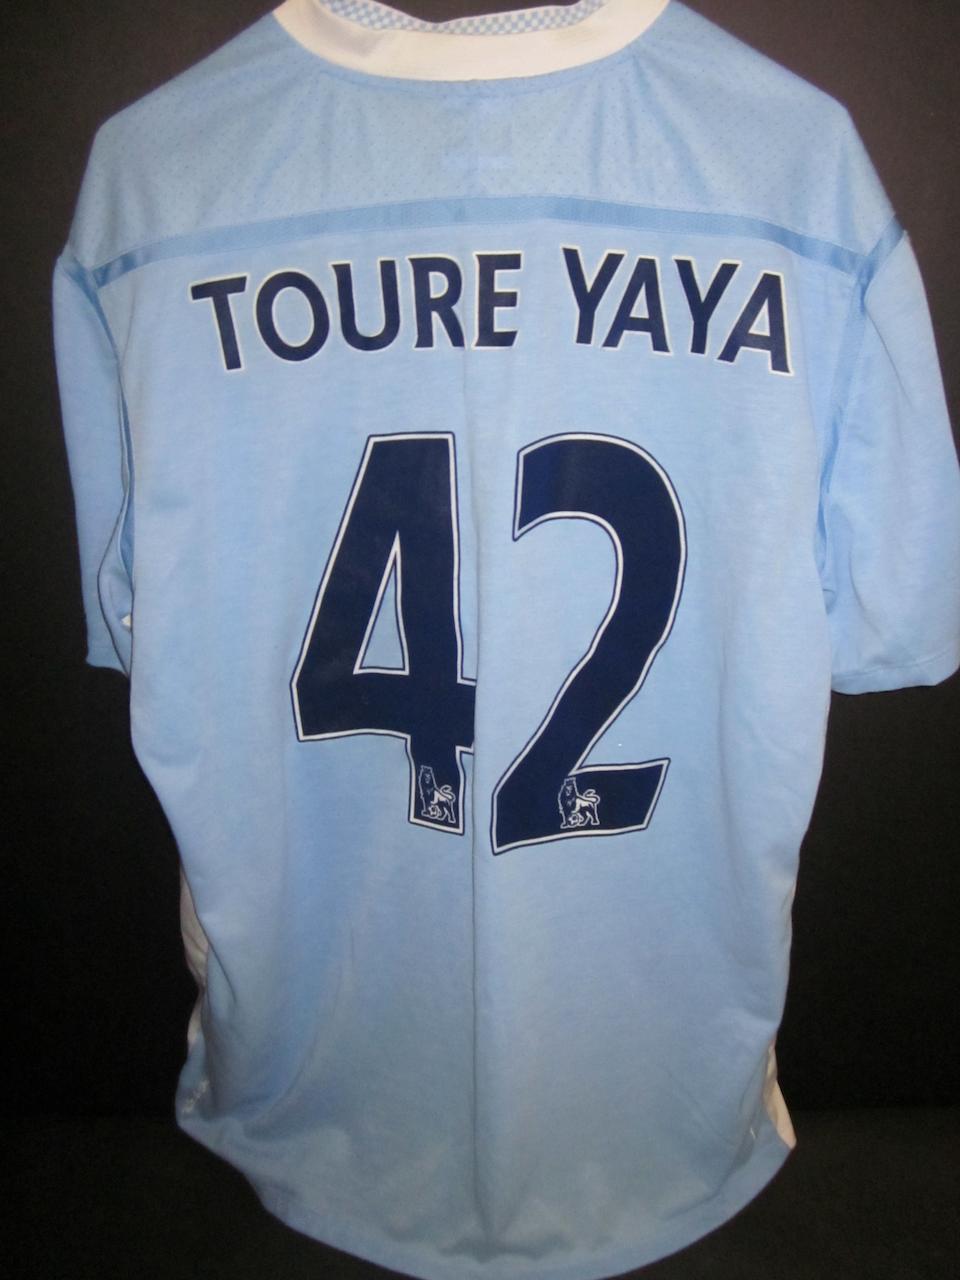 Toure Yaya match worn shirts